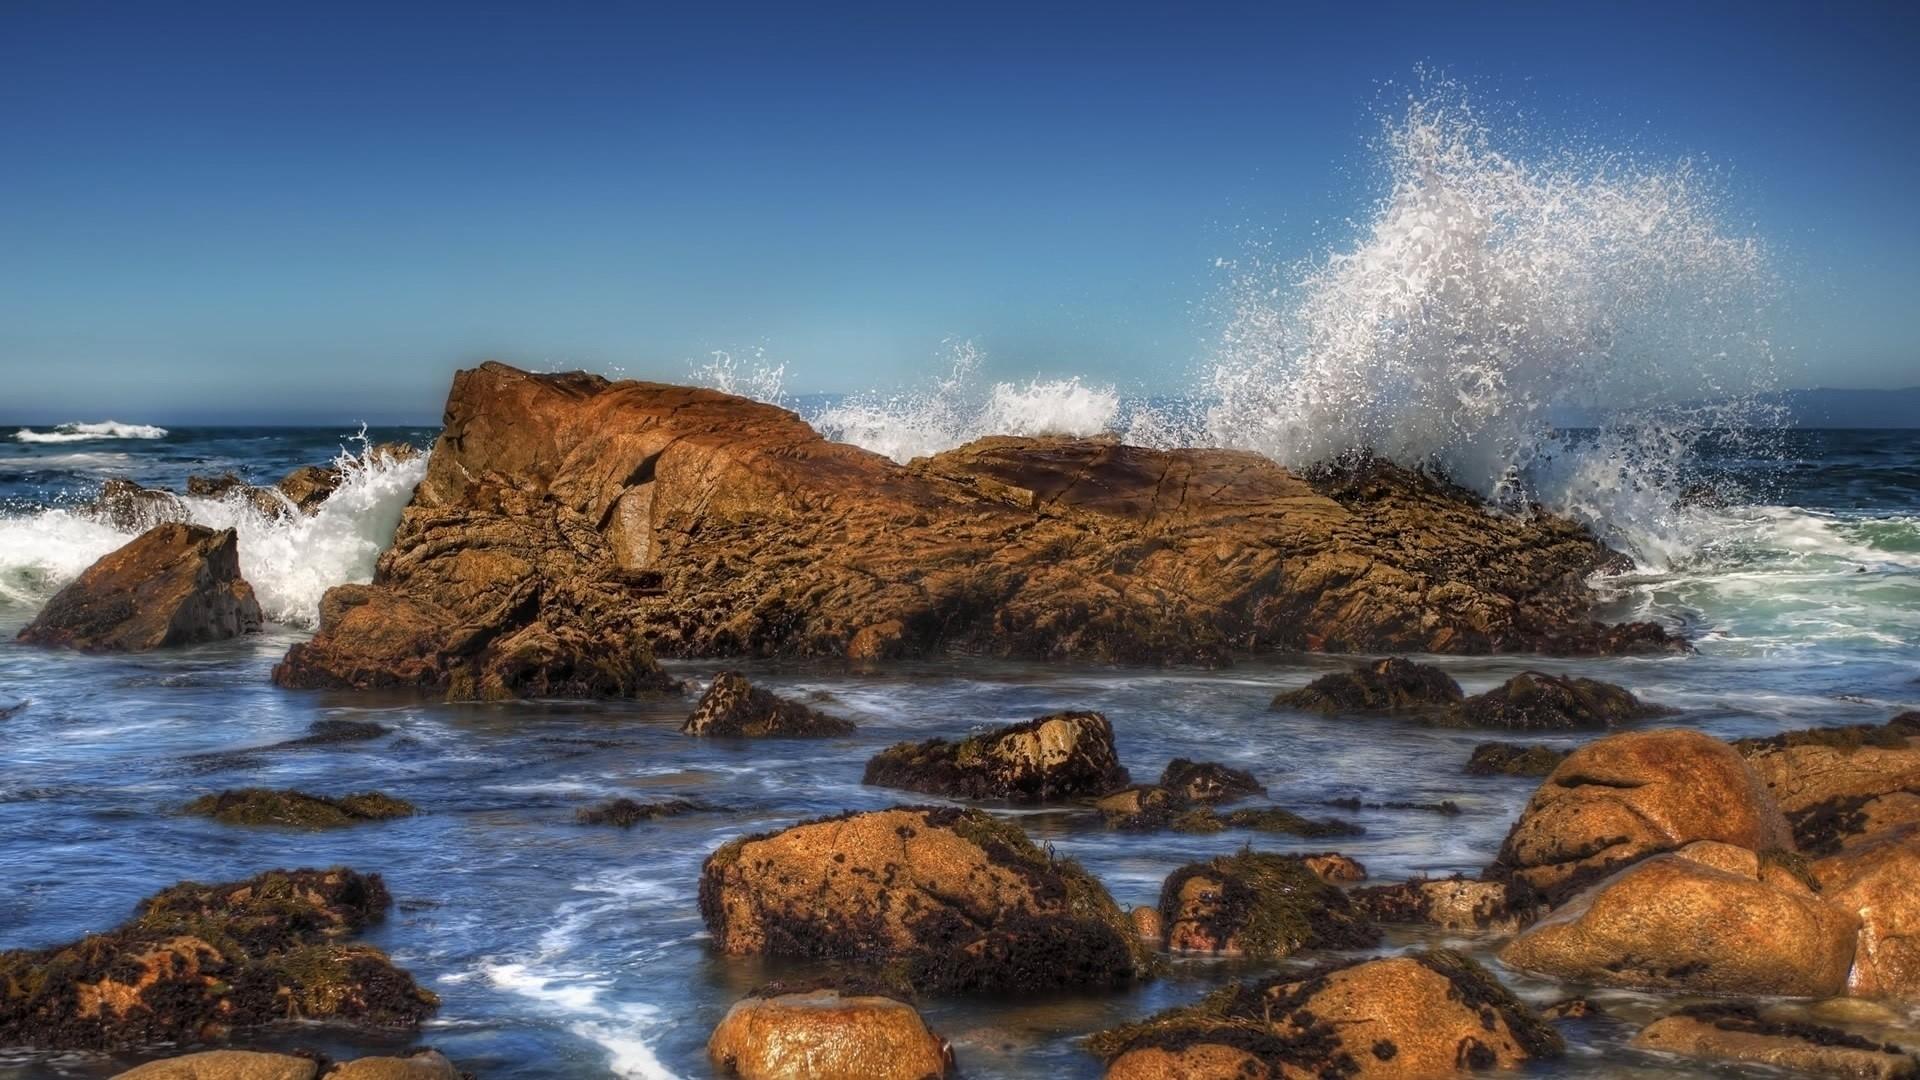 Ocean Nature wallpaper photo hd